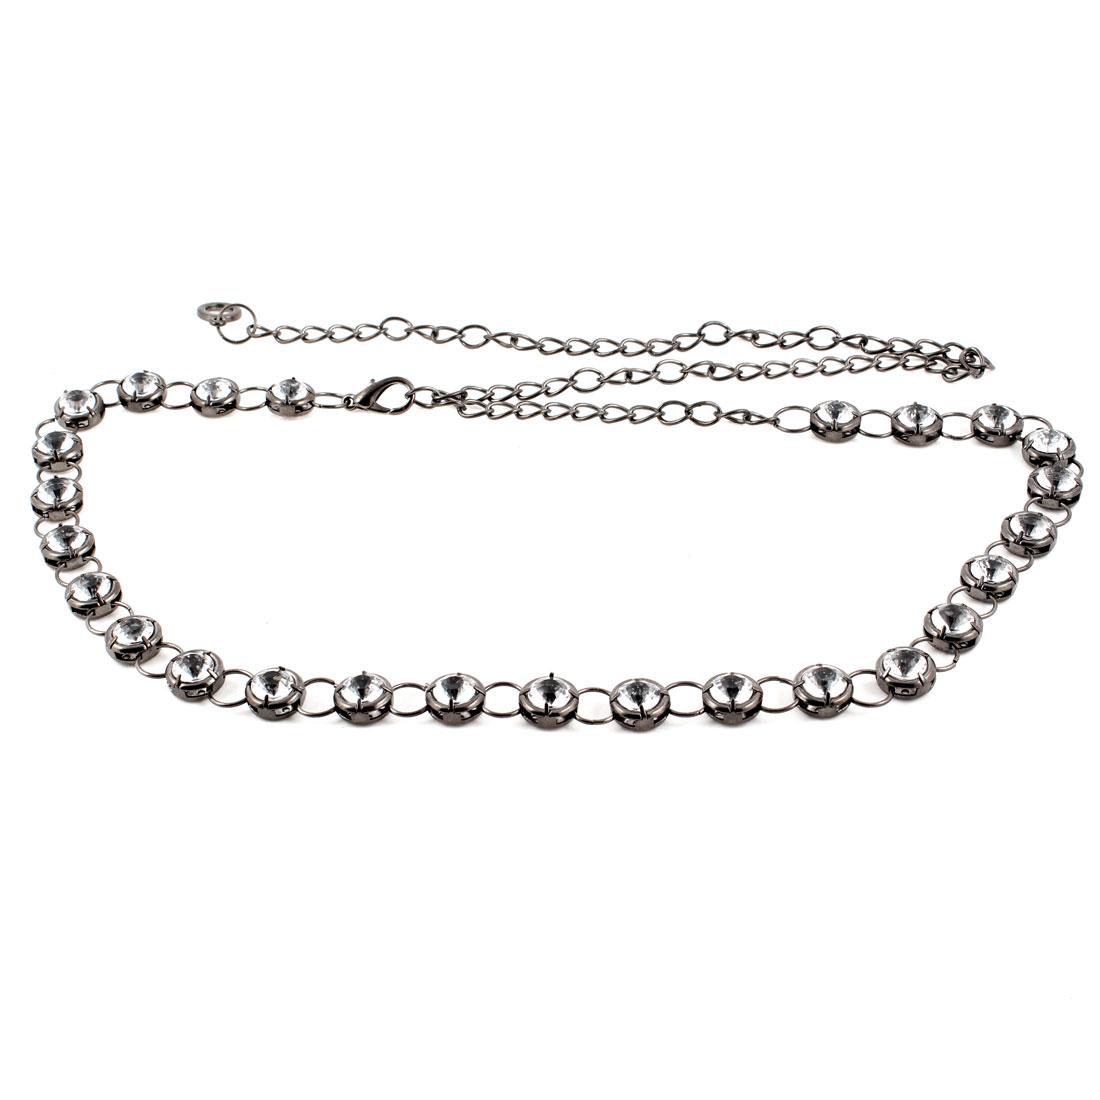 Lady Faux Crystal Decor Adjustable Metal Chain Waist Belt Dark Gray Clear